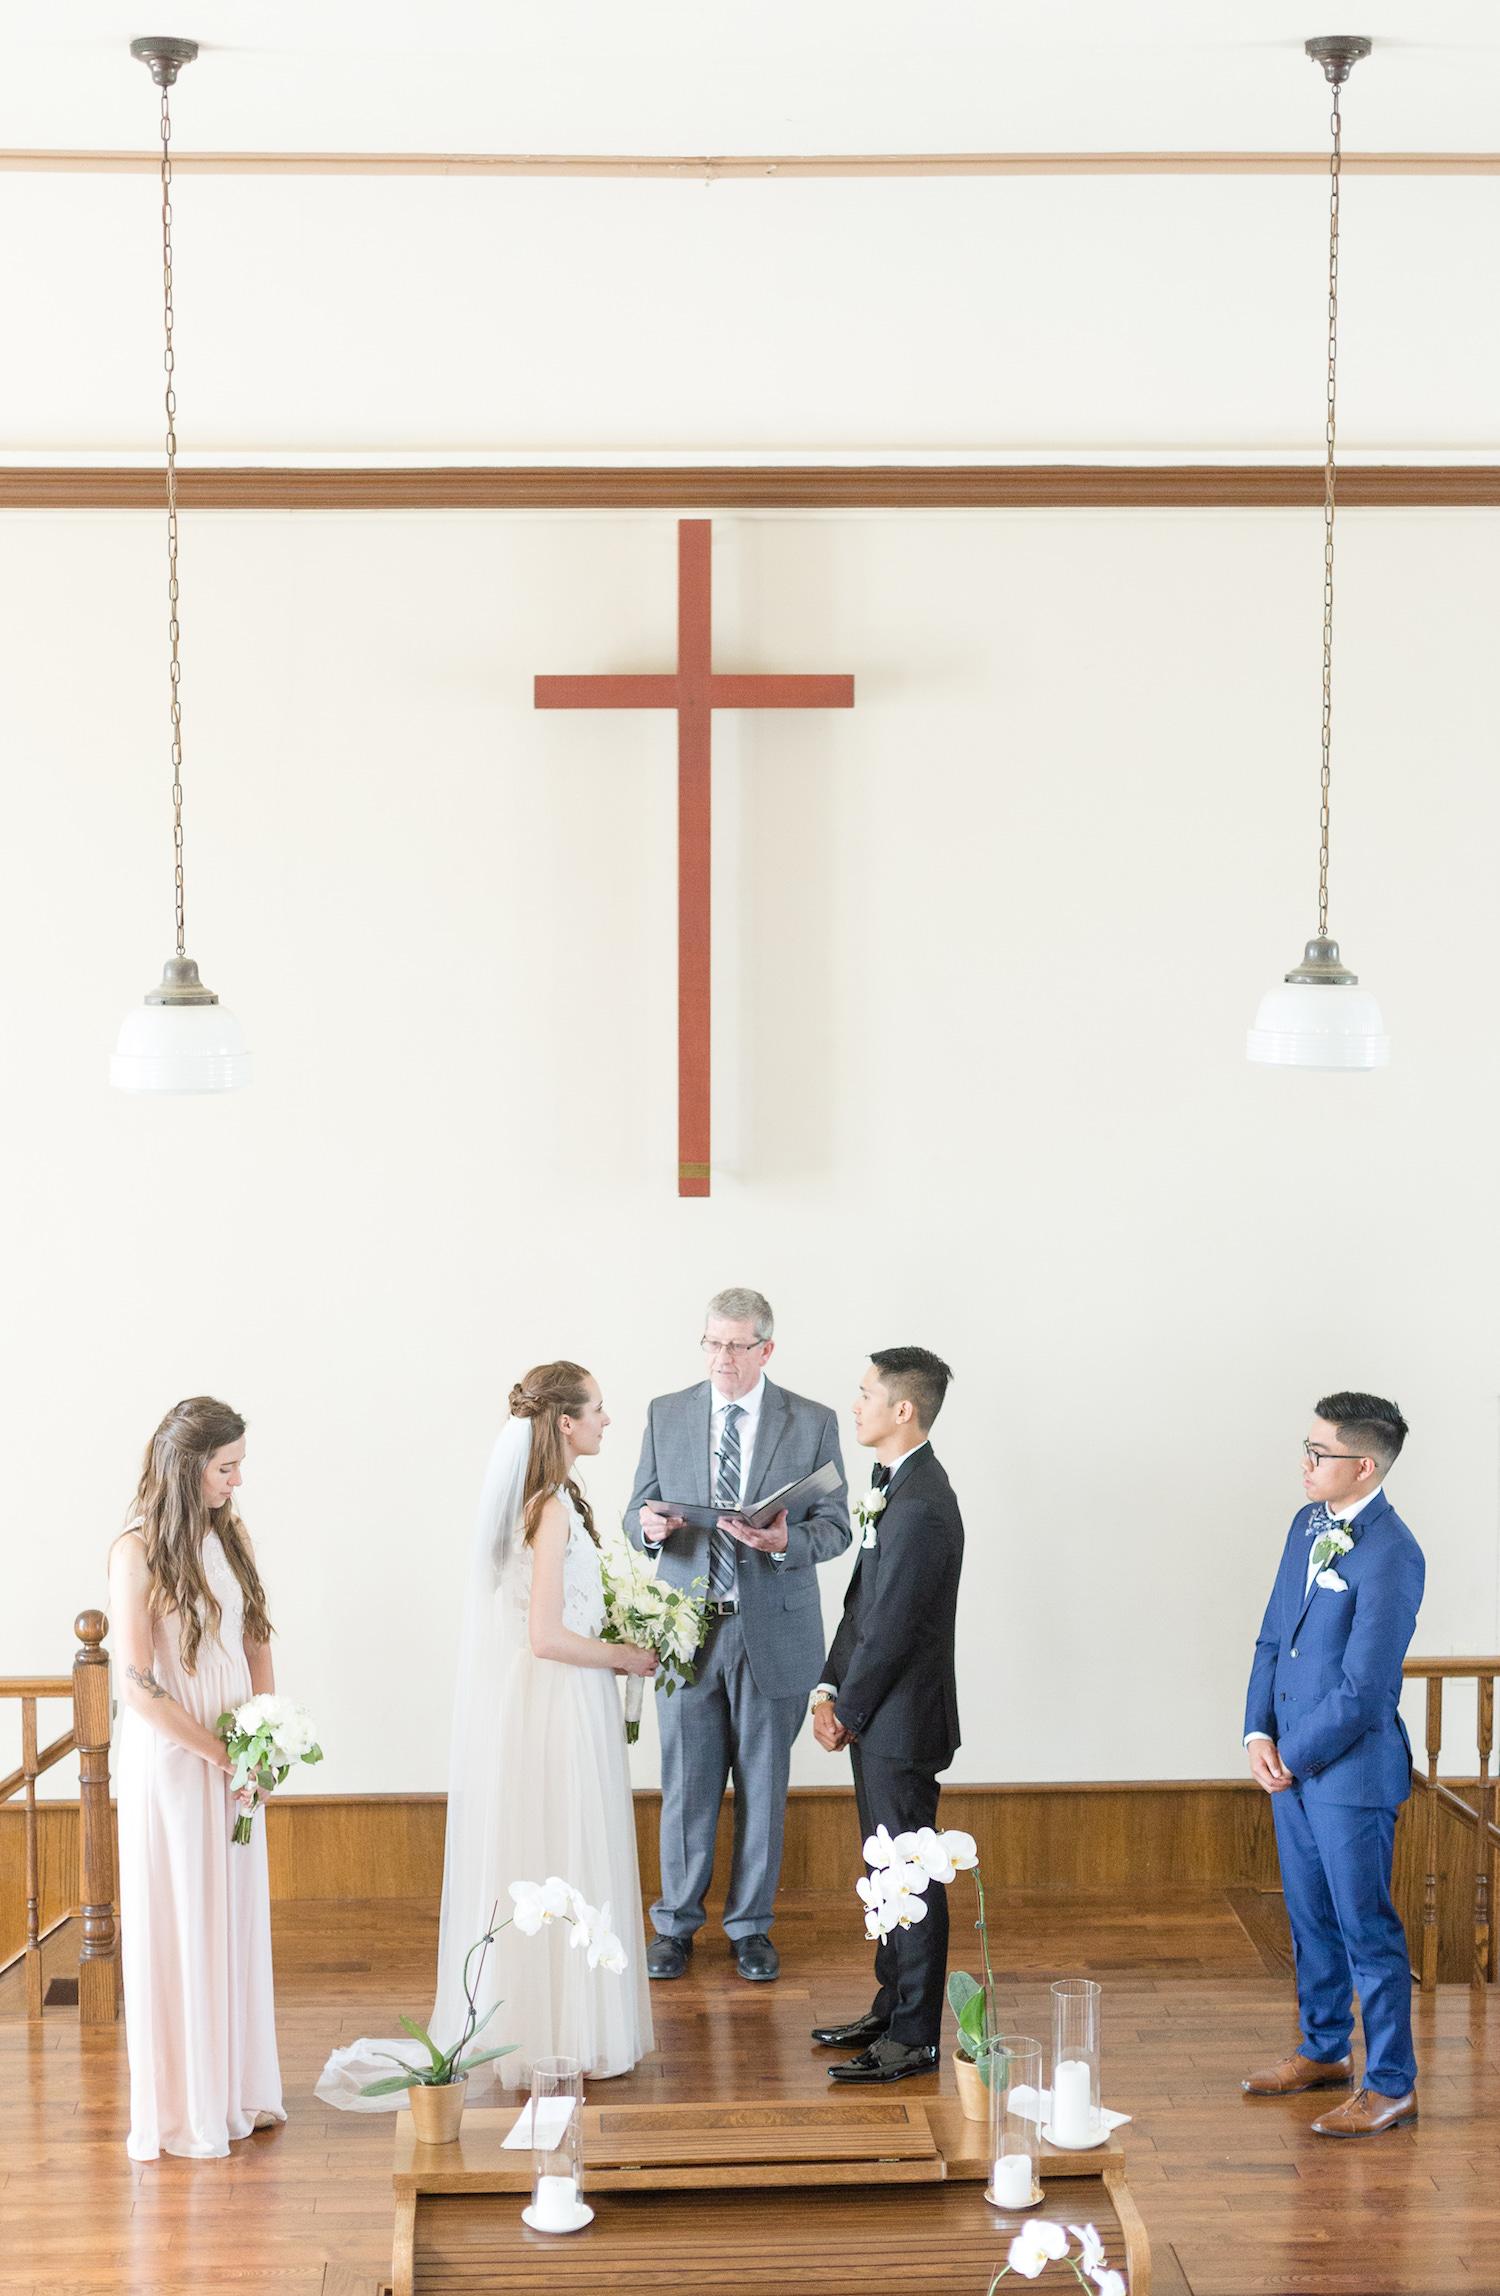 ontario-wedding-small-village-church.jpg